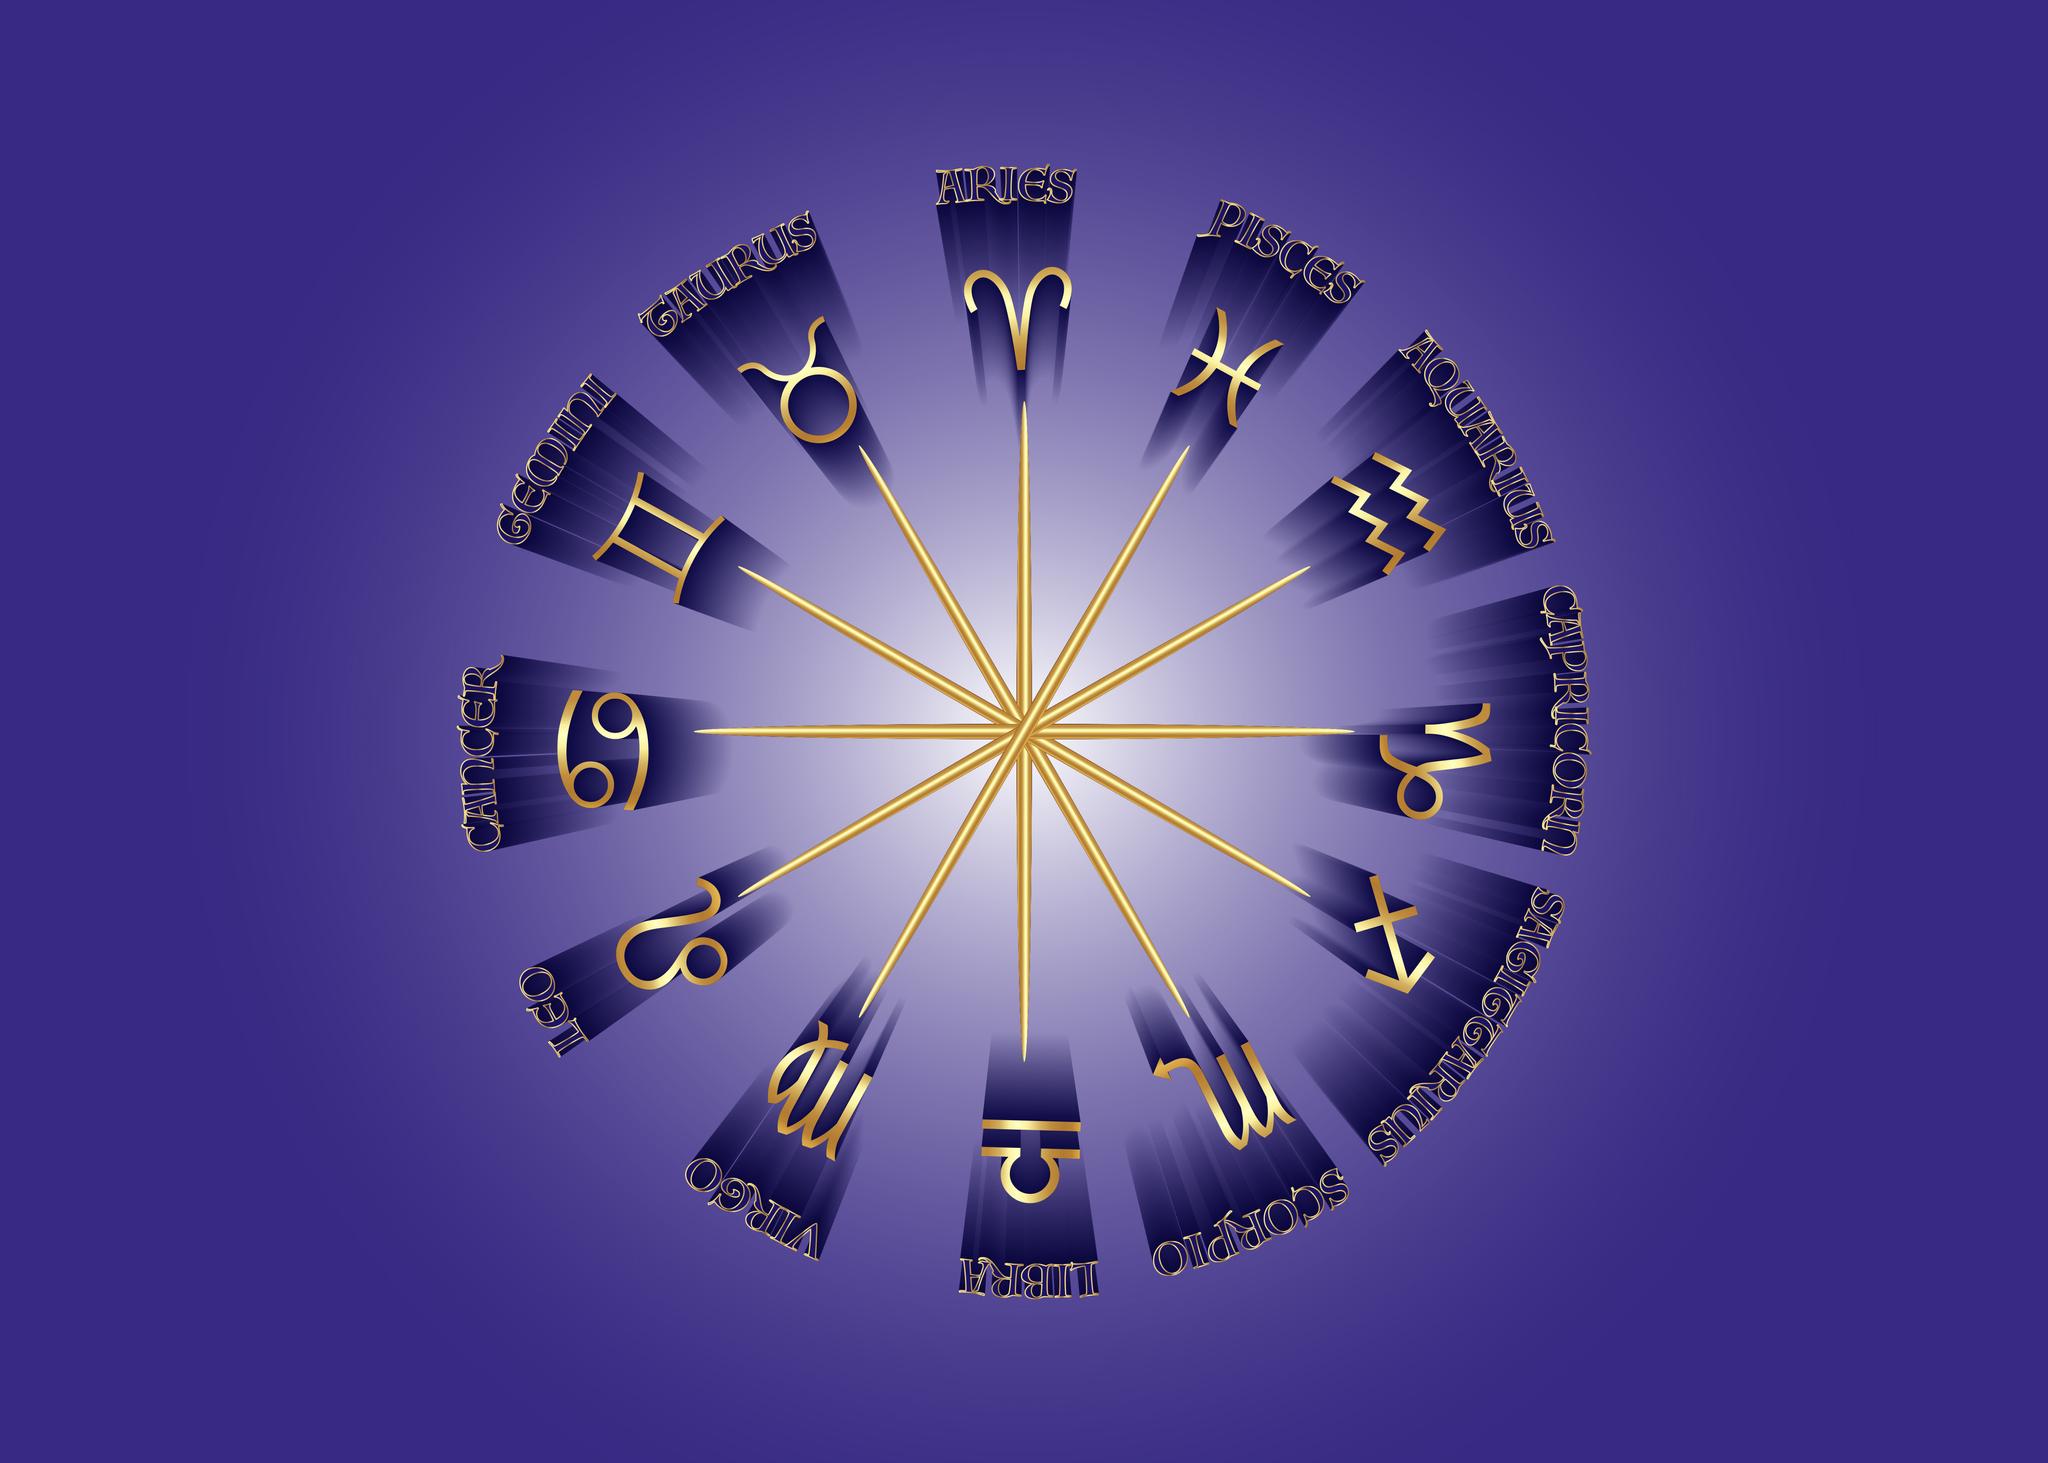 zodiac szűz flörtöl